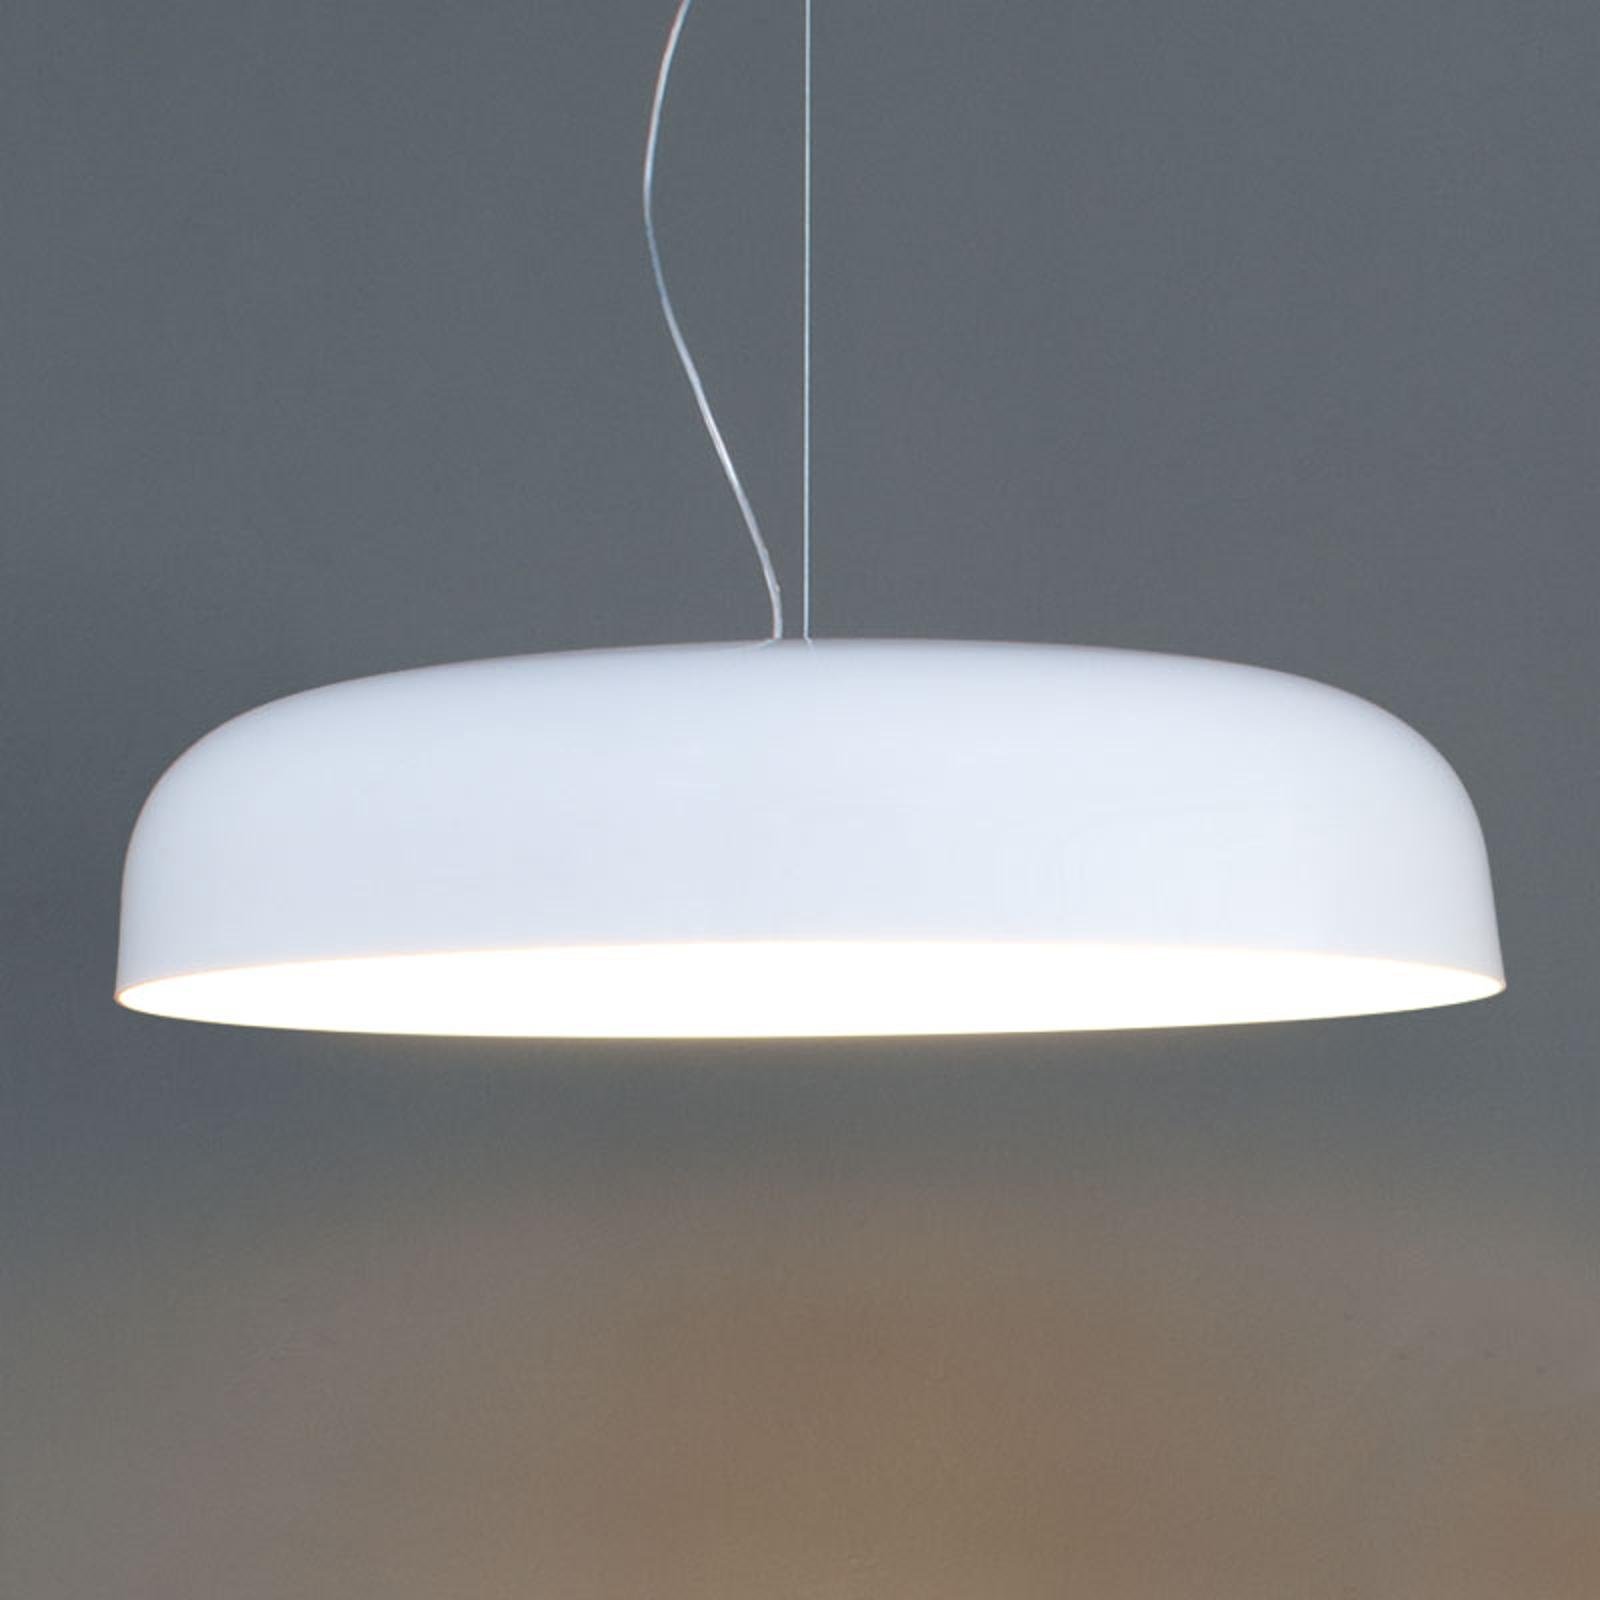 Oluce Canopy - hanglamp, 90 cm, wit